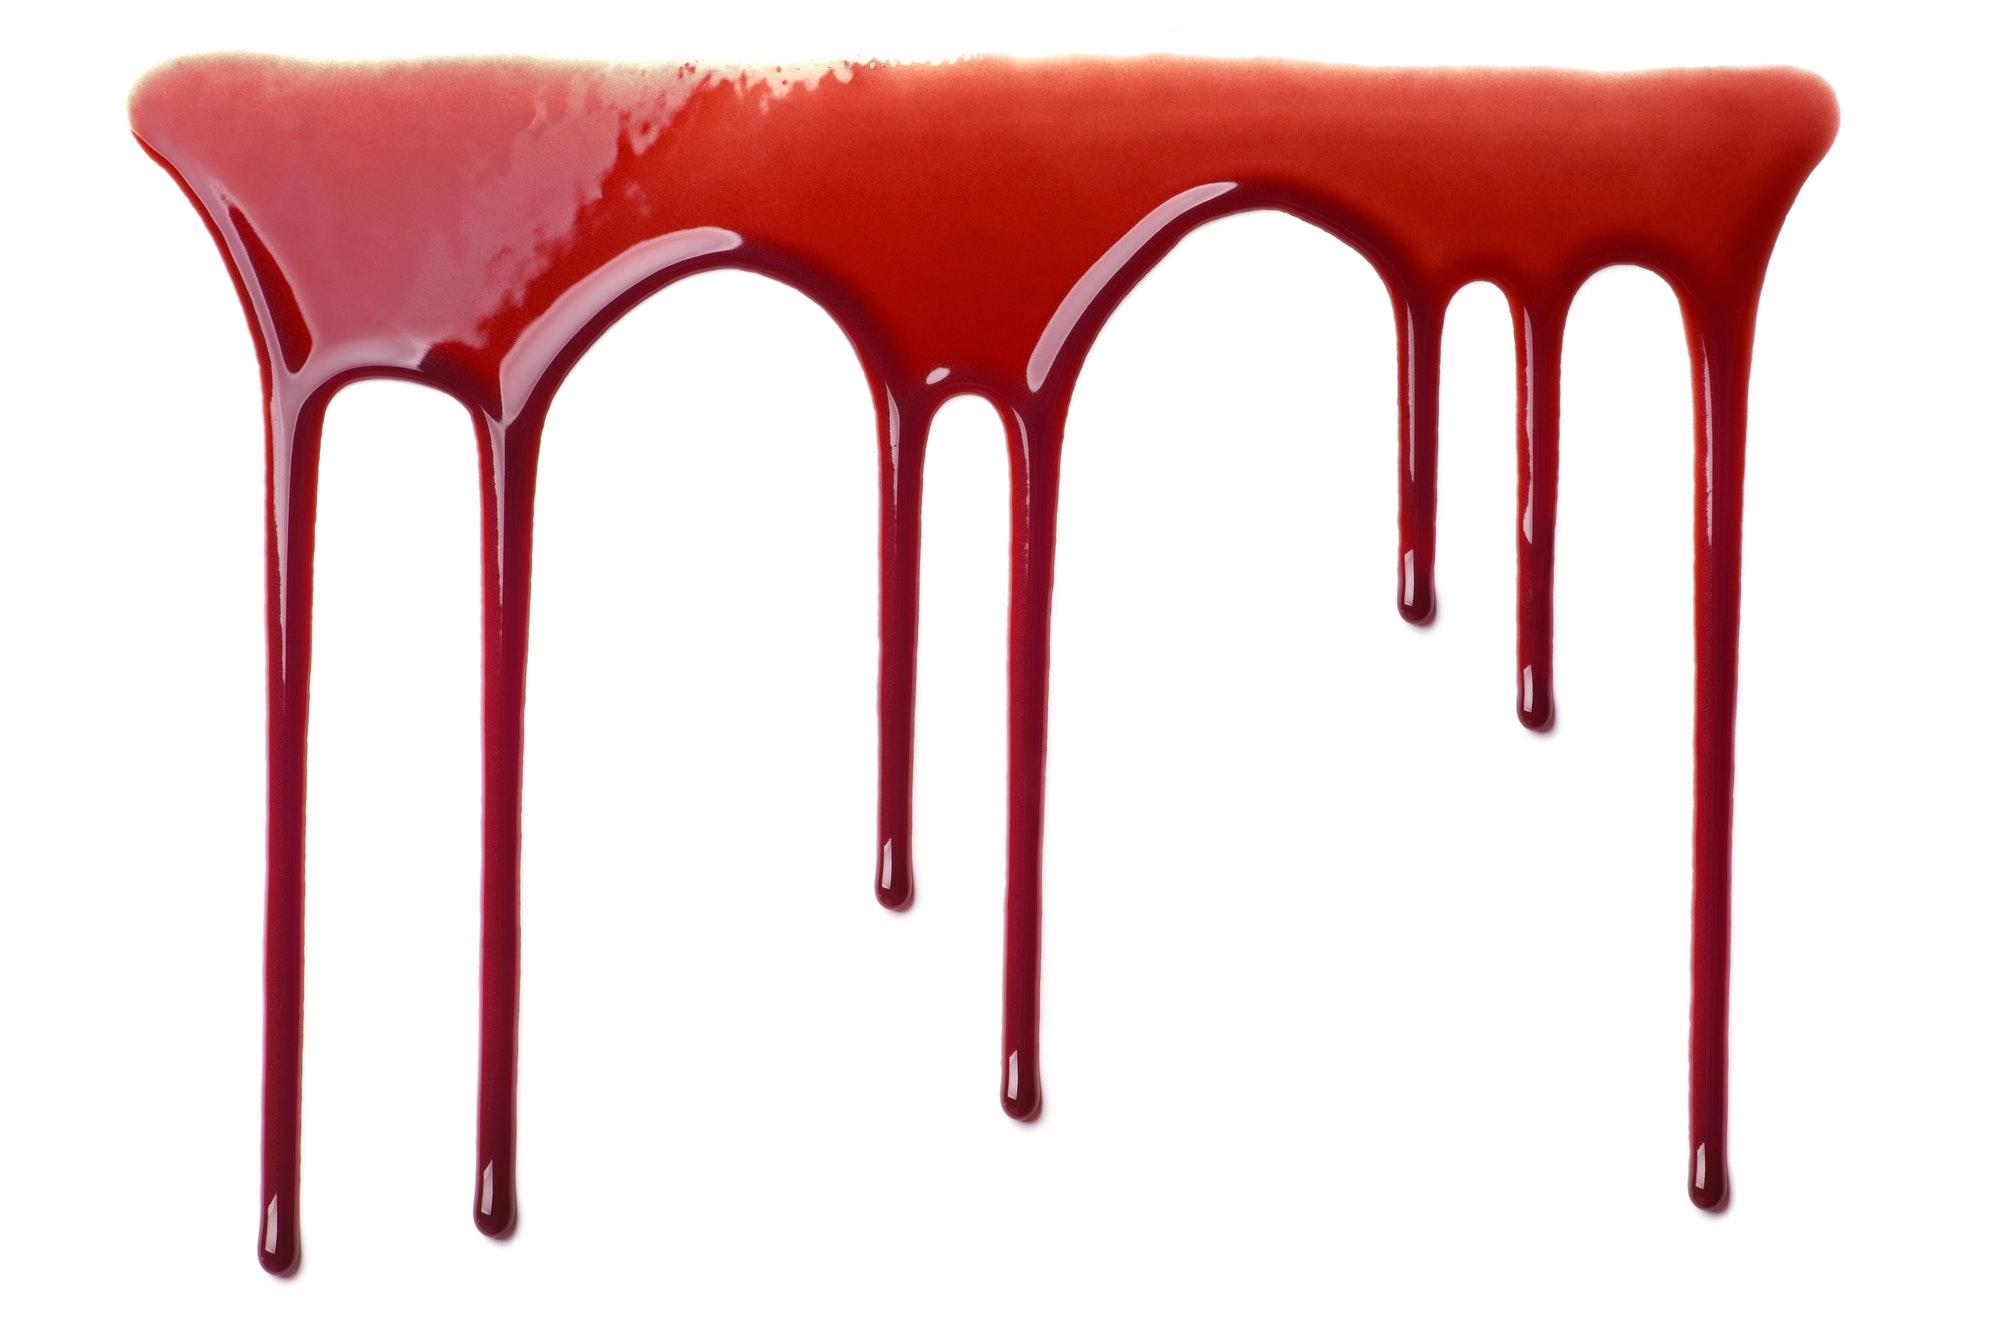 Flowing Blood